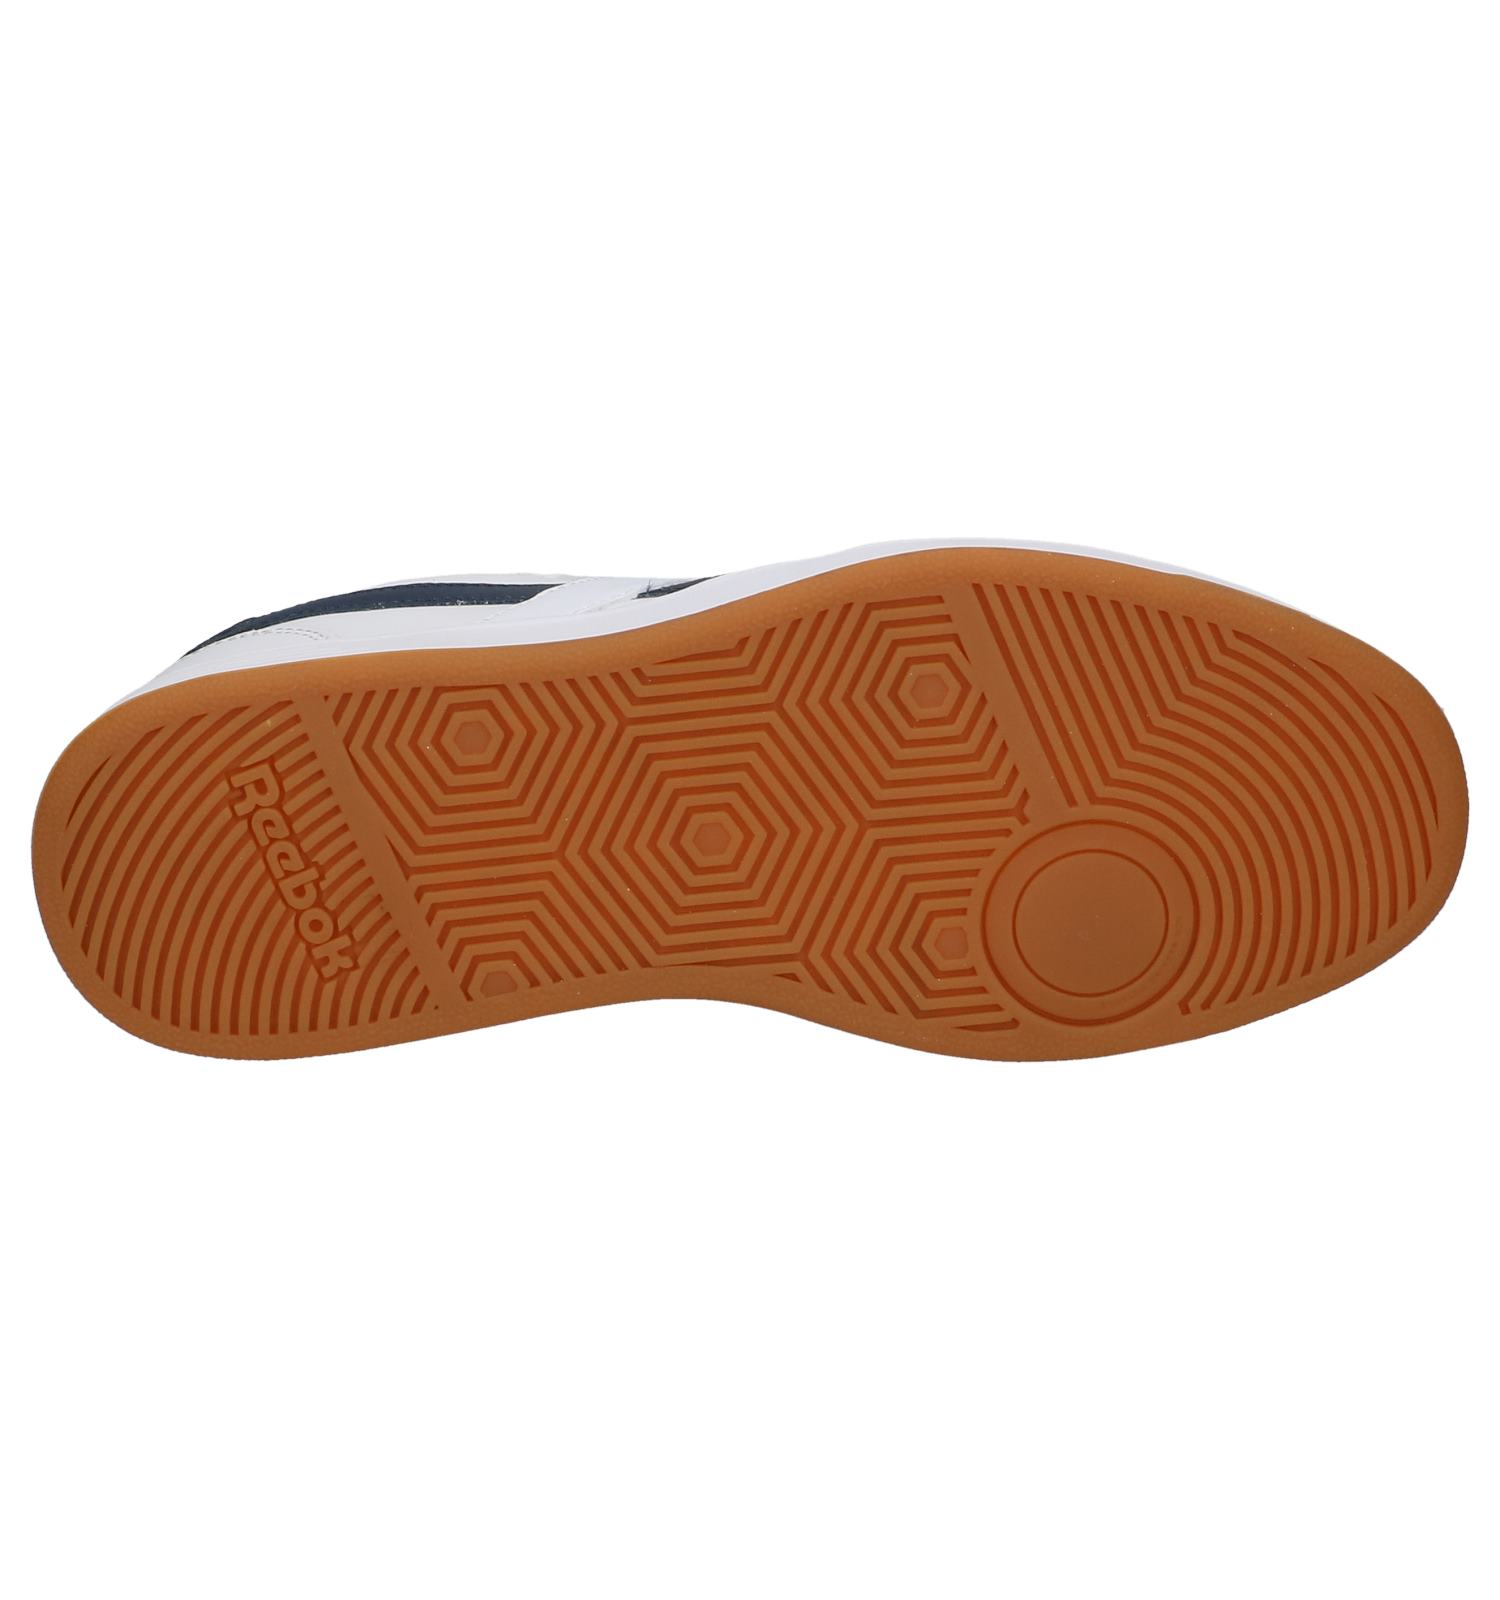 Sportieve Witte Lage Royal Reebok Techqu Sneakers 54RLc3qAj